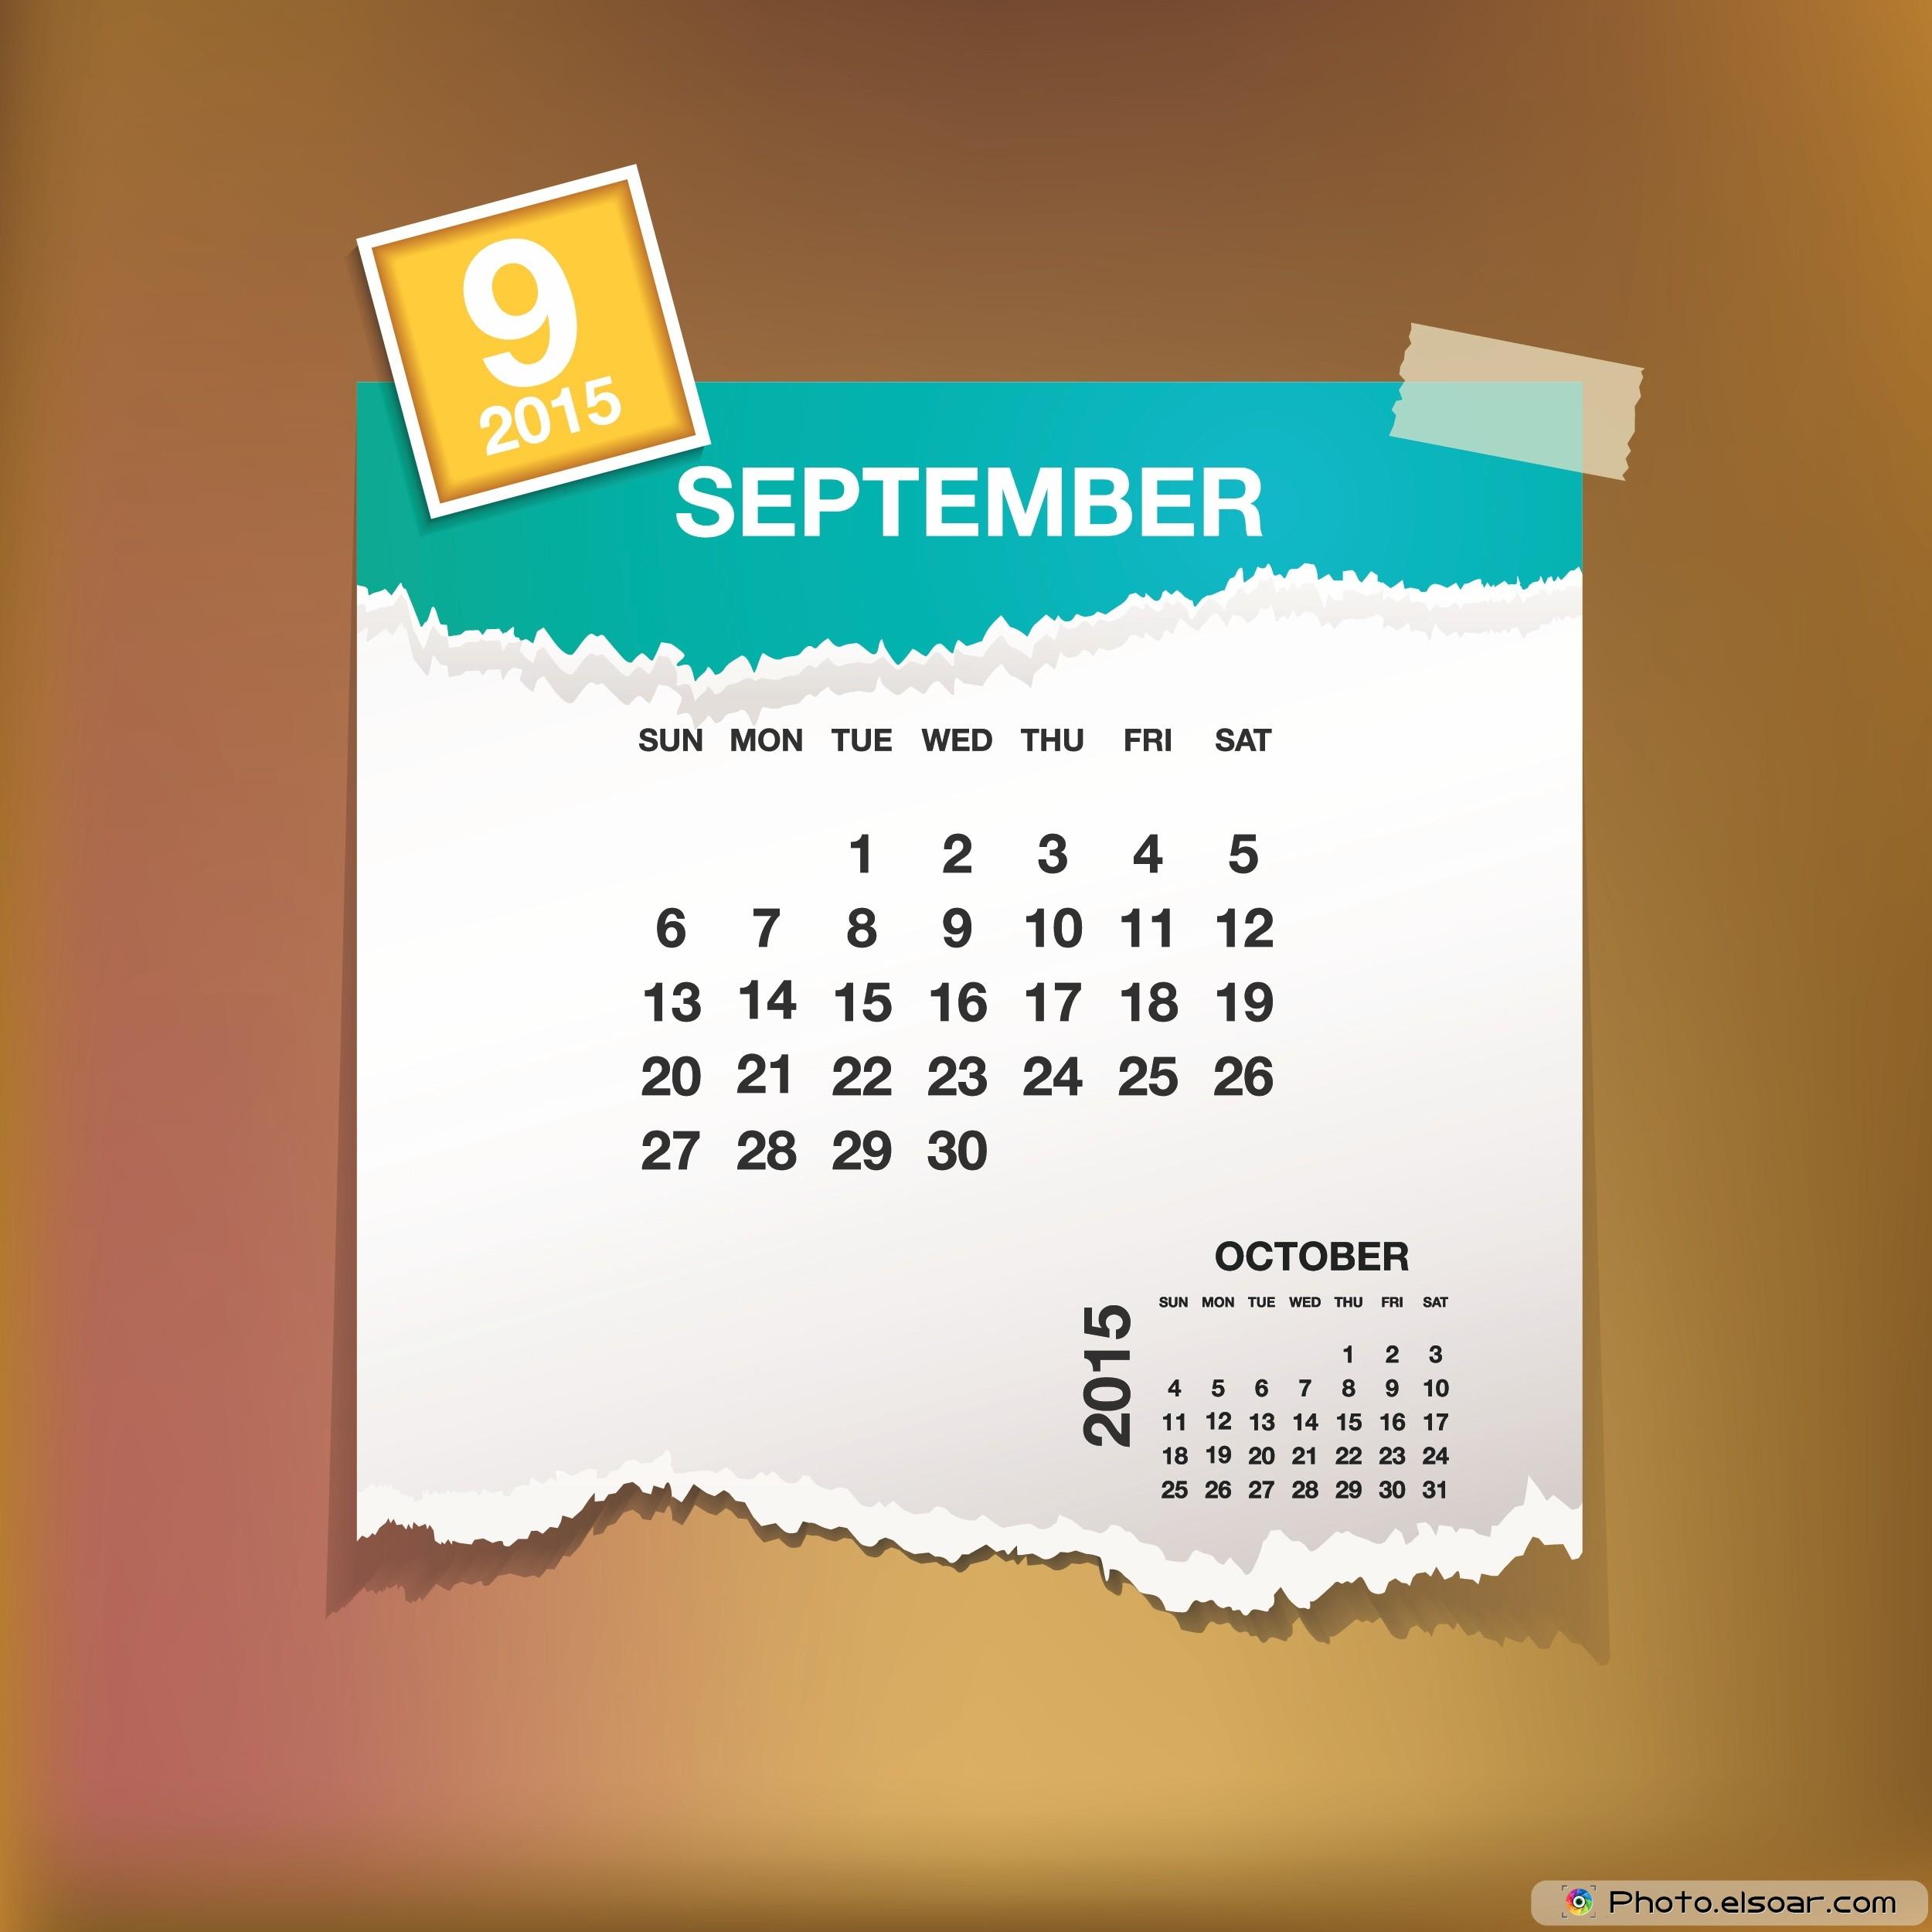 Famous 1 2 3 Nu Kapitel Resume Thin 1 Inch Hexagon Template Flat 10 Hour Schedule Templates 100 Dollar Bill Template Youthful 10x10 Grid Template Orange12 Month Budget Template Monthly 2015 Calendars Printable Templates \u2022 Elsoar